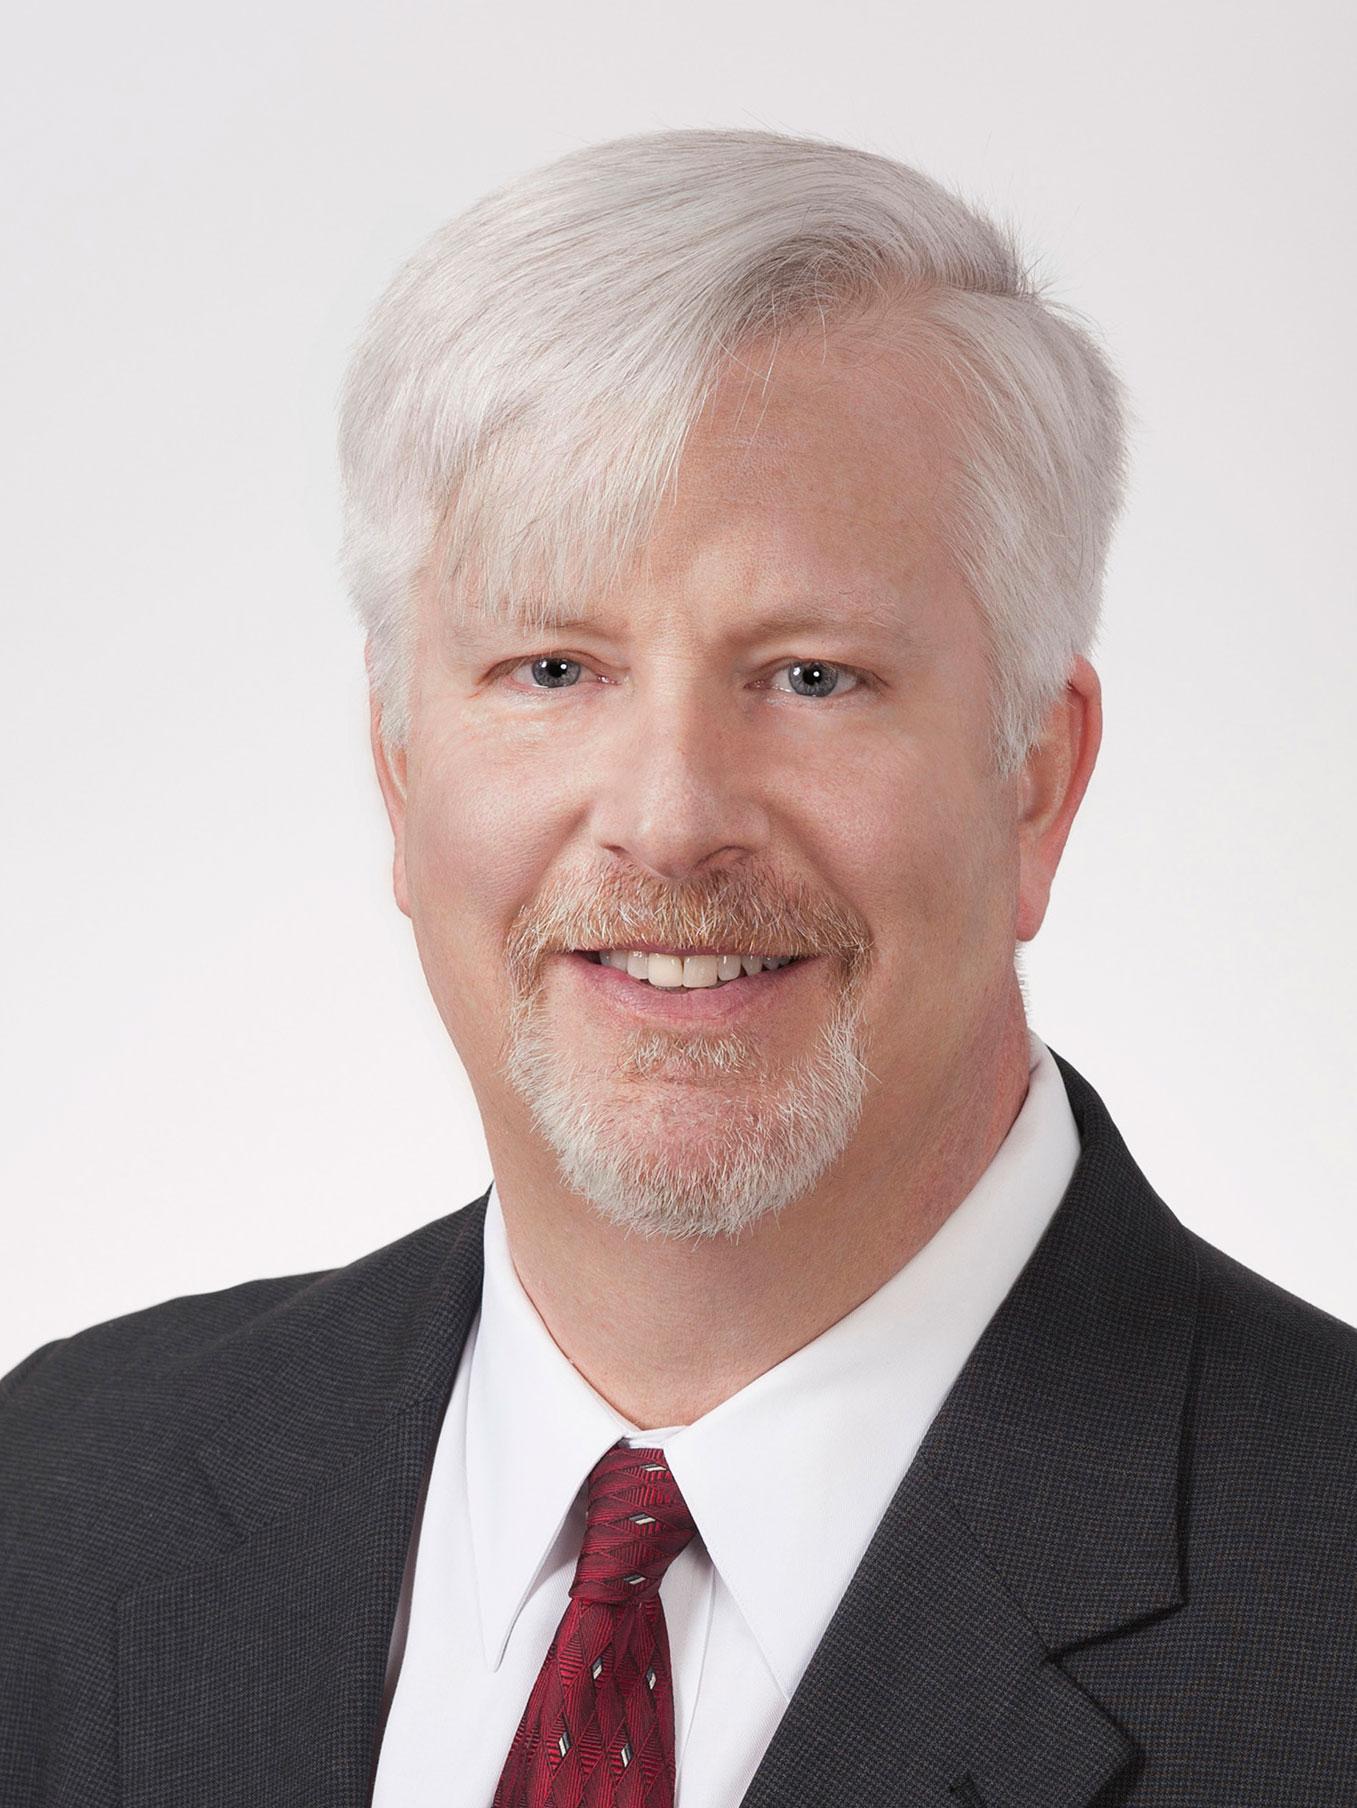 P. Arthur Huprich, CMT, Chief Market Technician for Day Hagan Asset Management in Sarasota, FL.